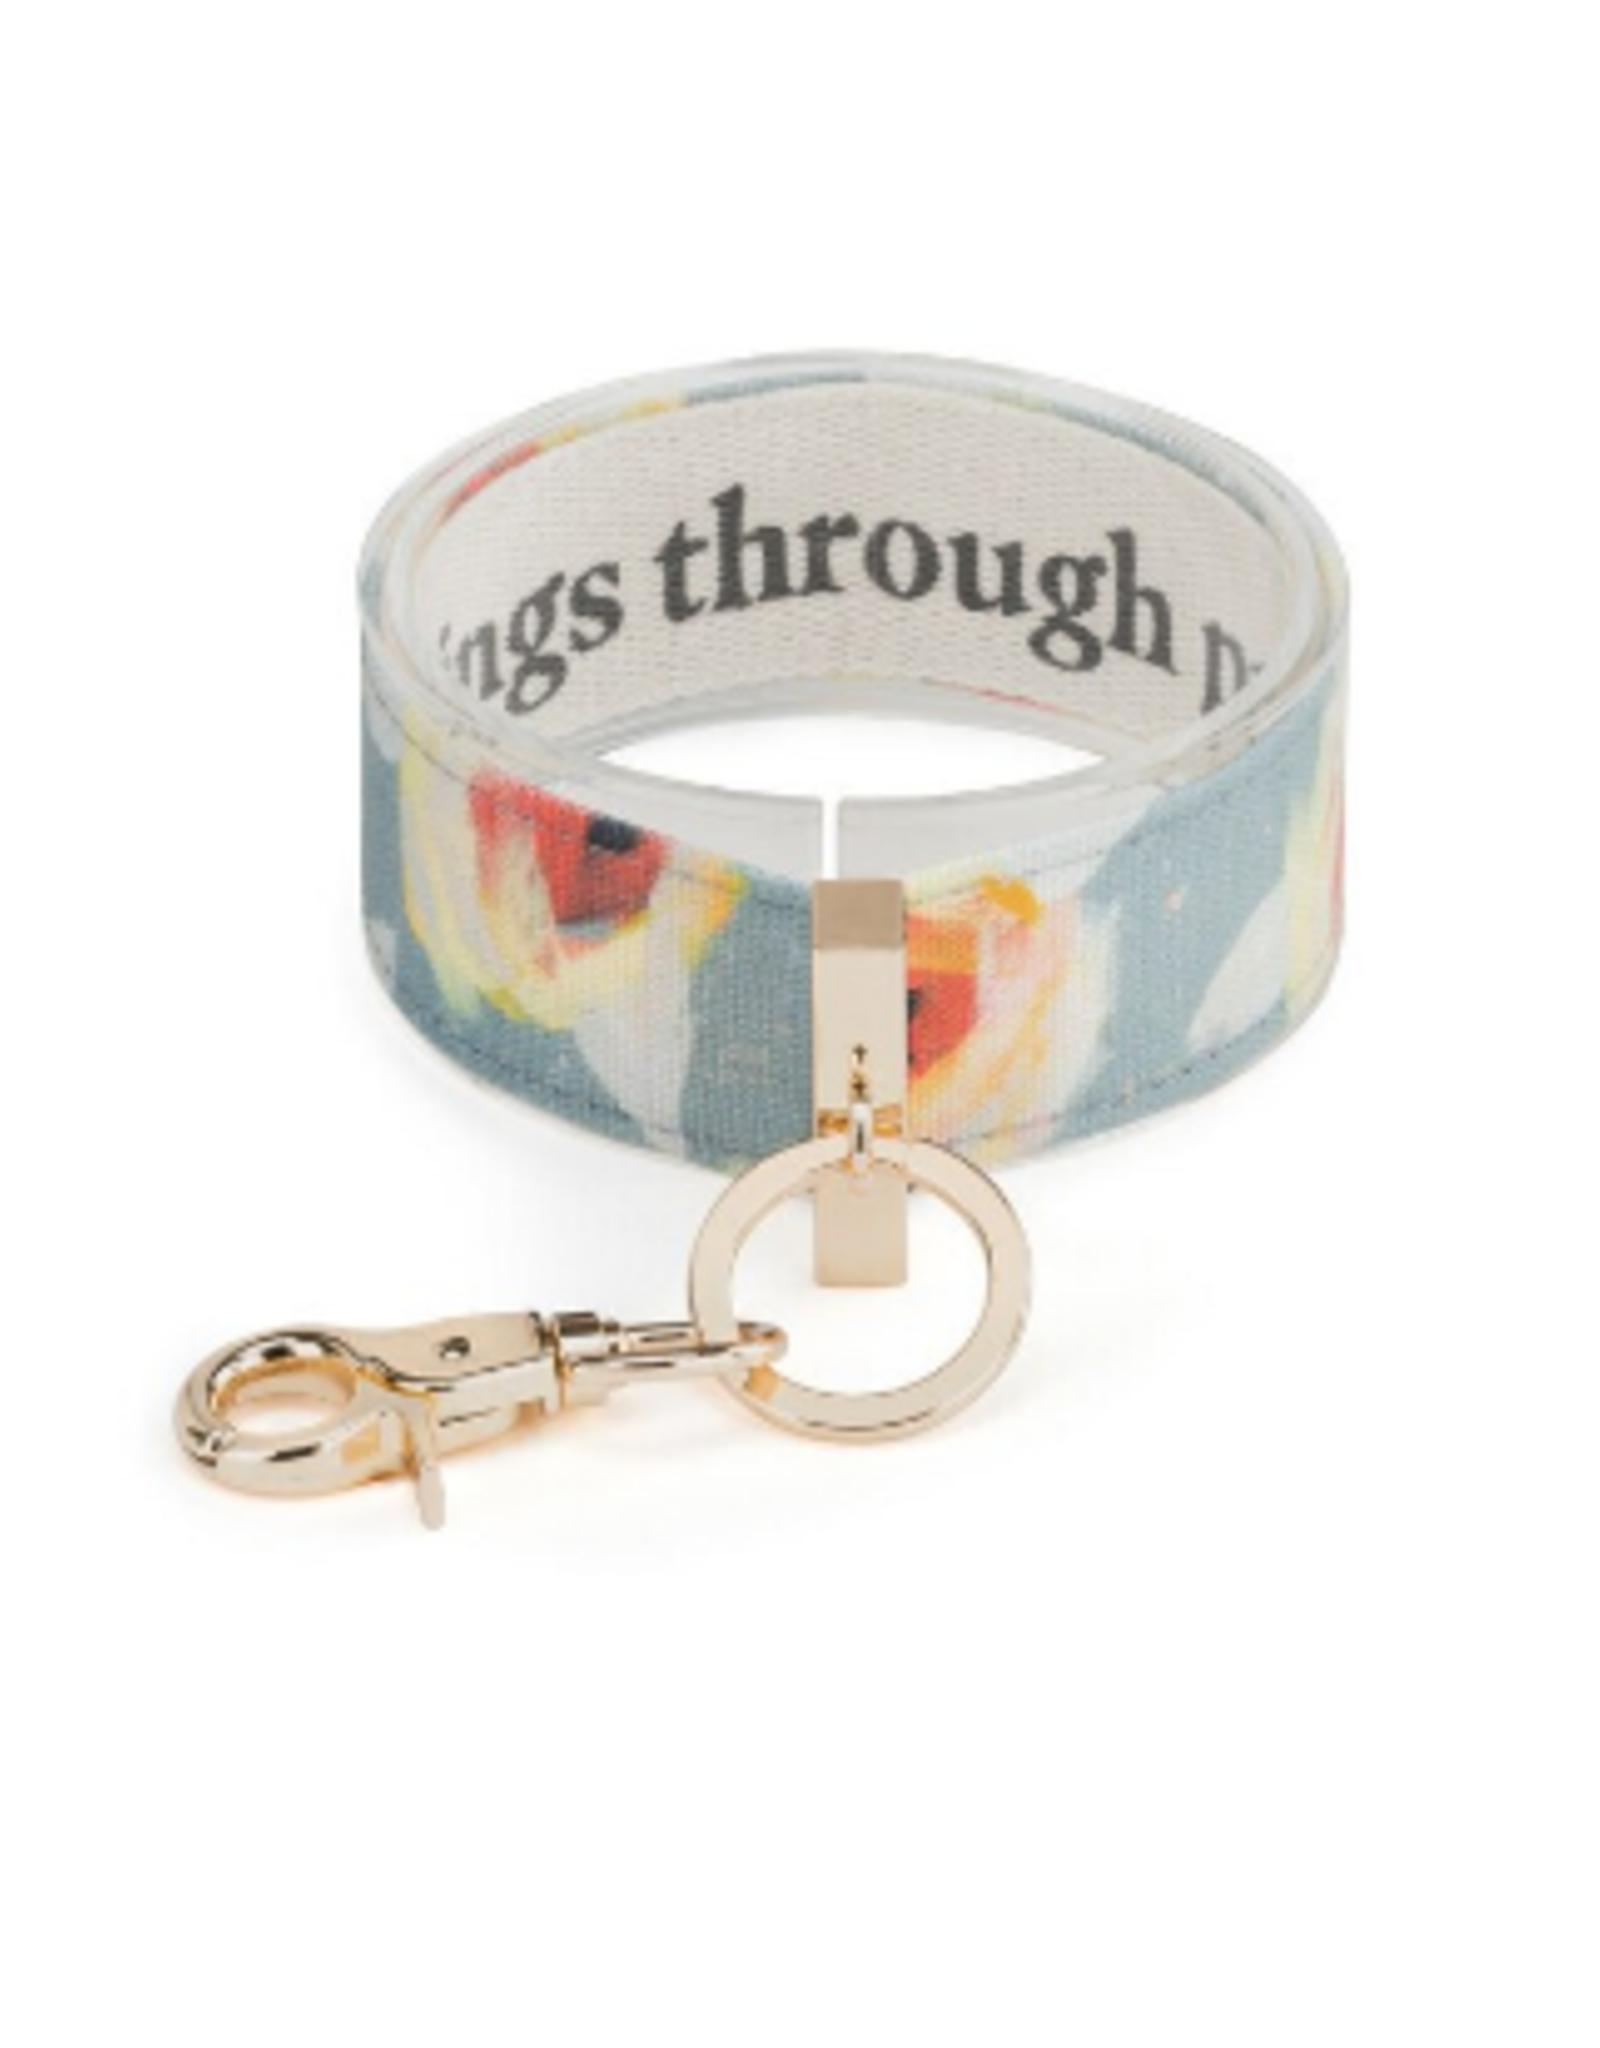 Wrist Strap Key Chain, All Things Through Prayer